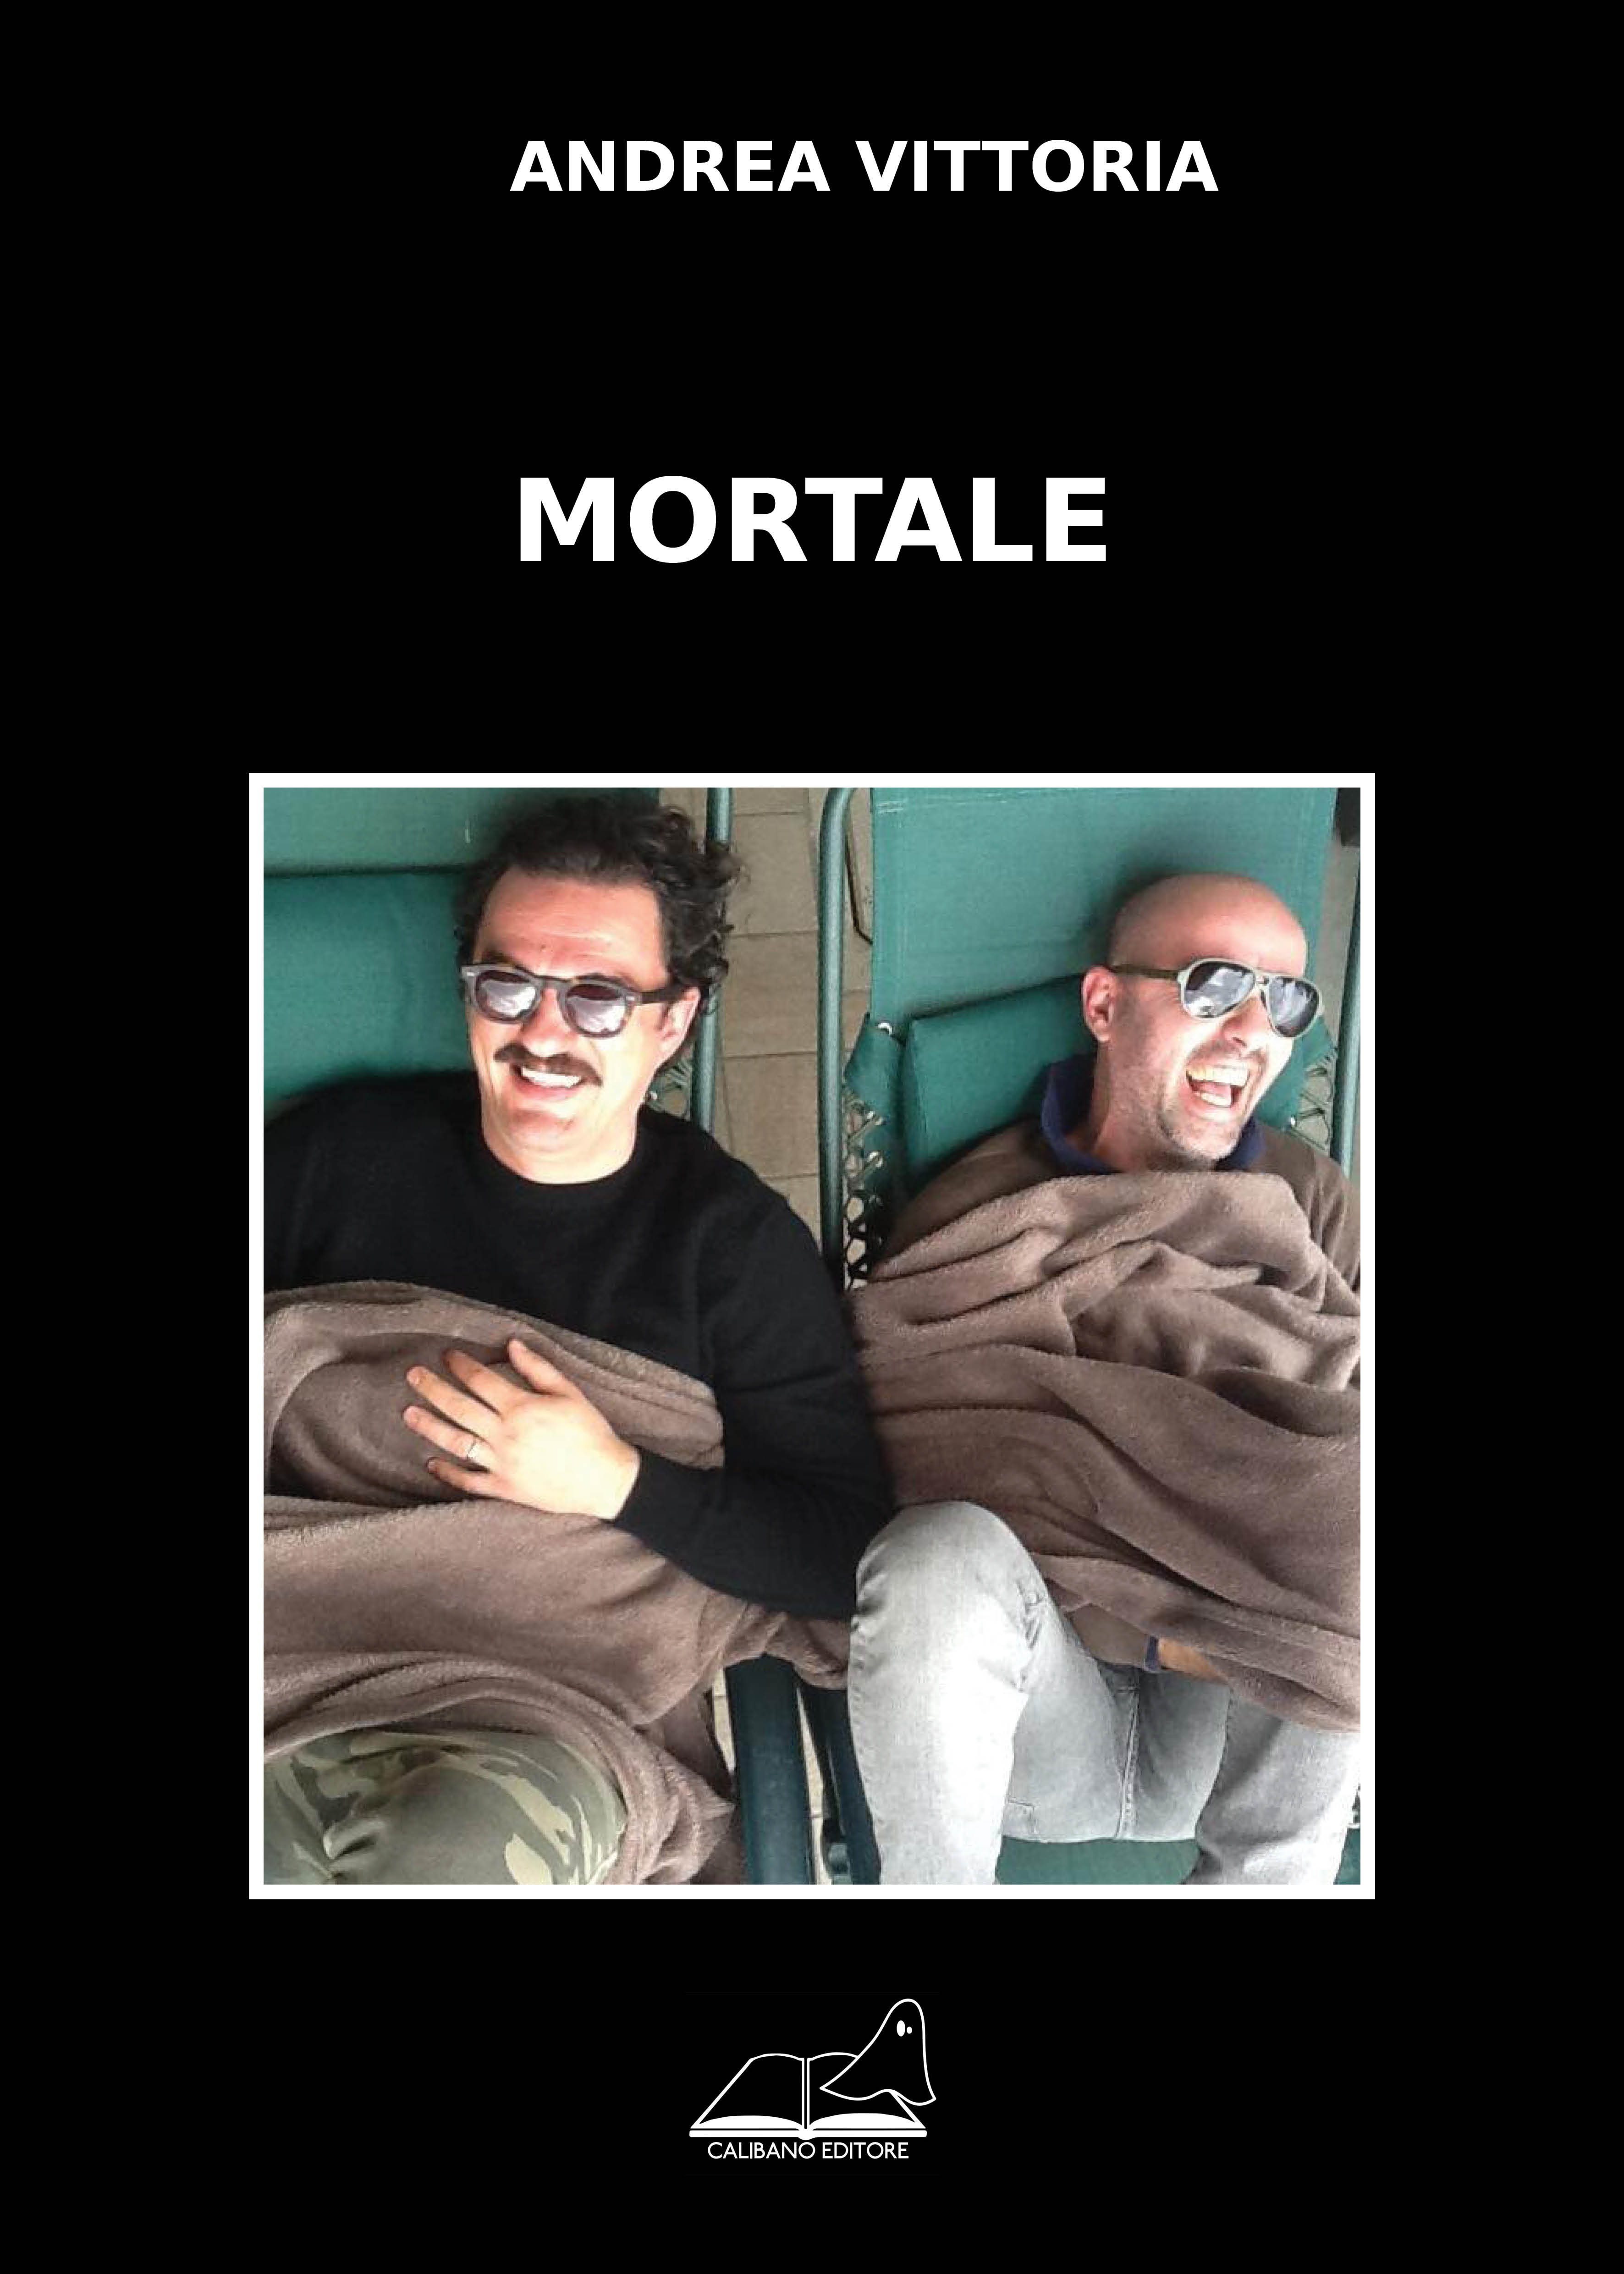 Mortale-image-1%>